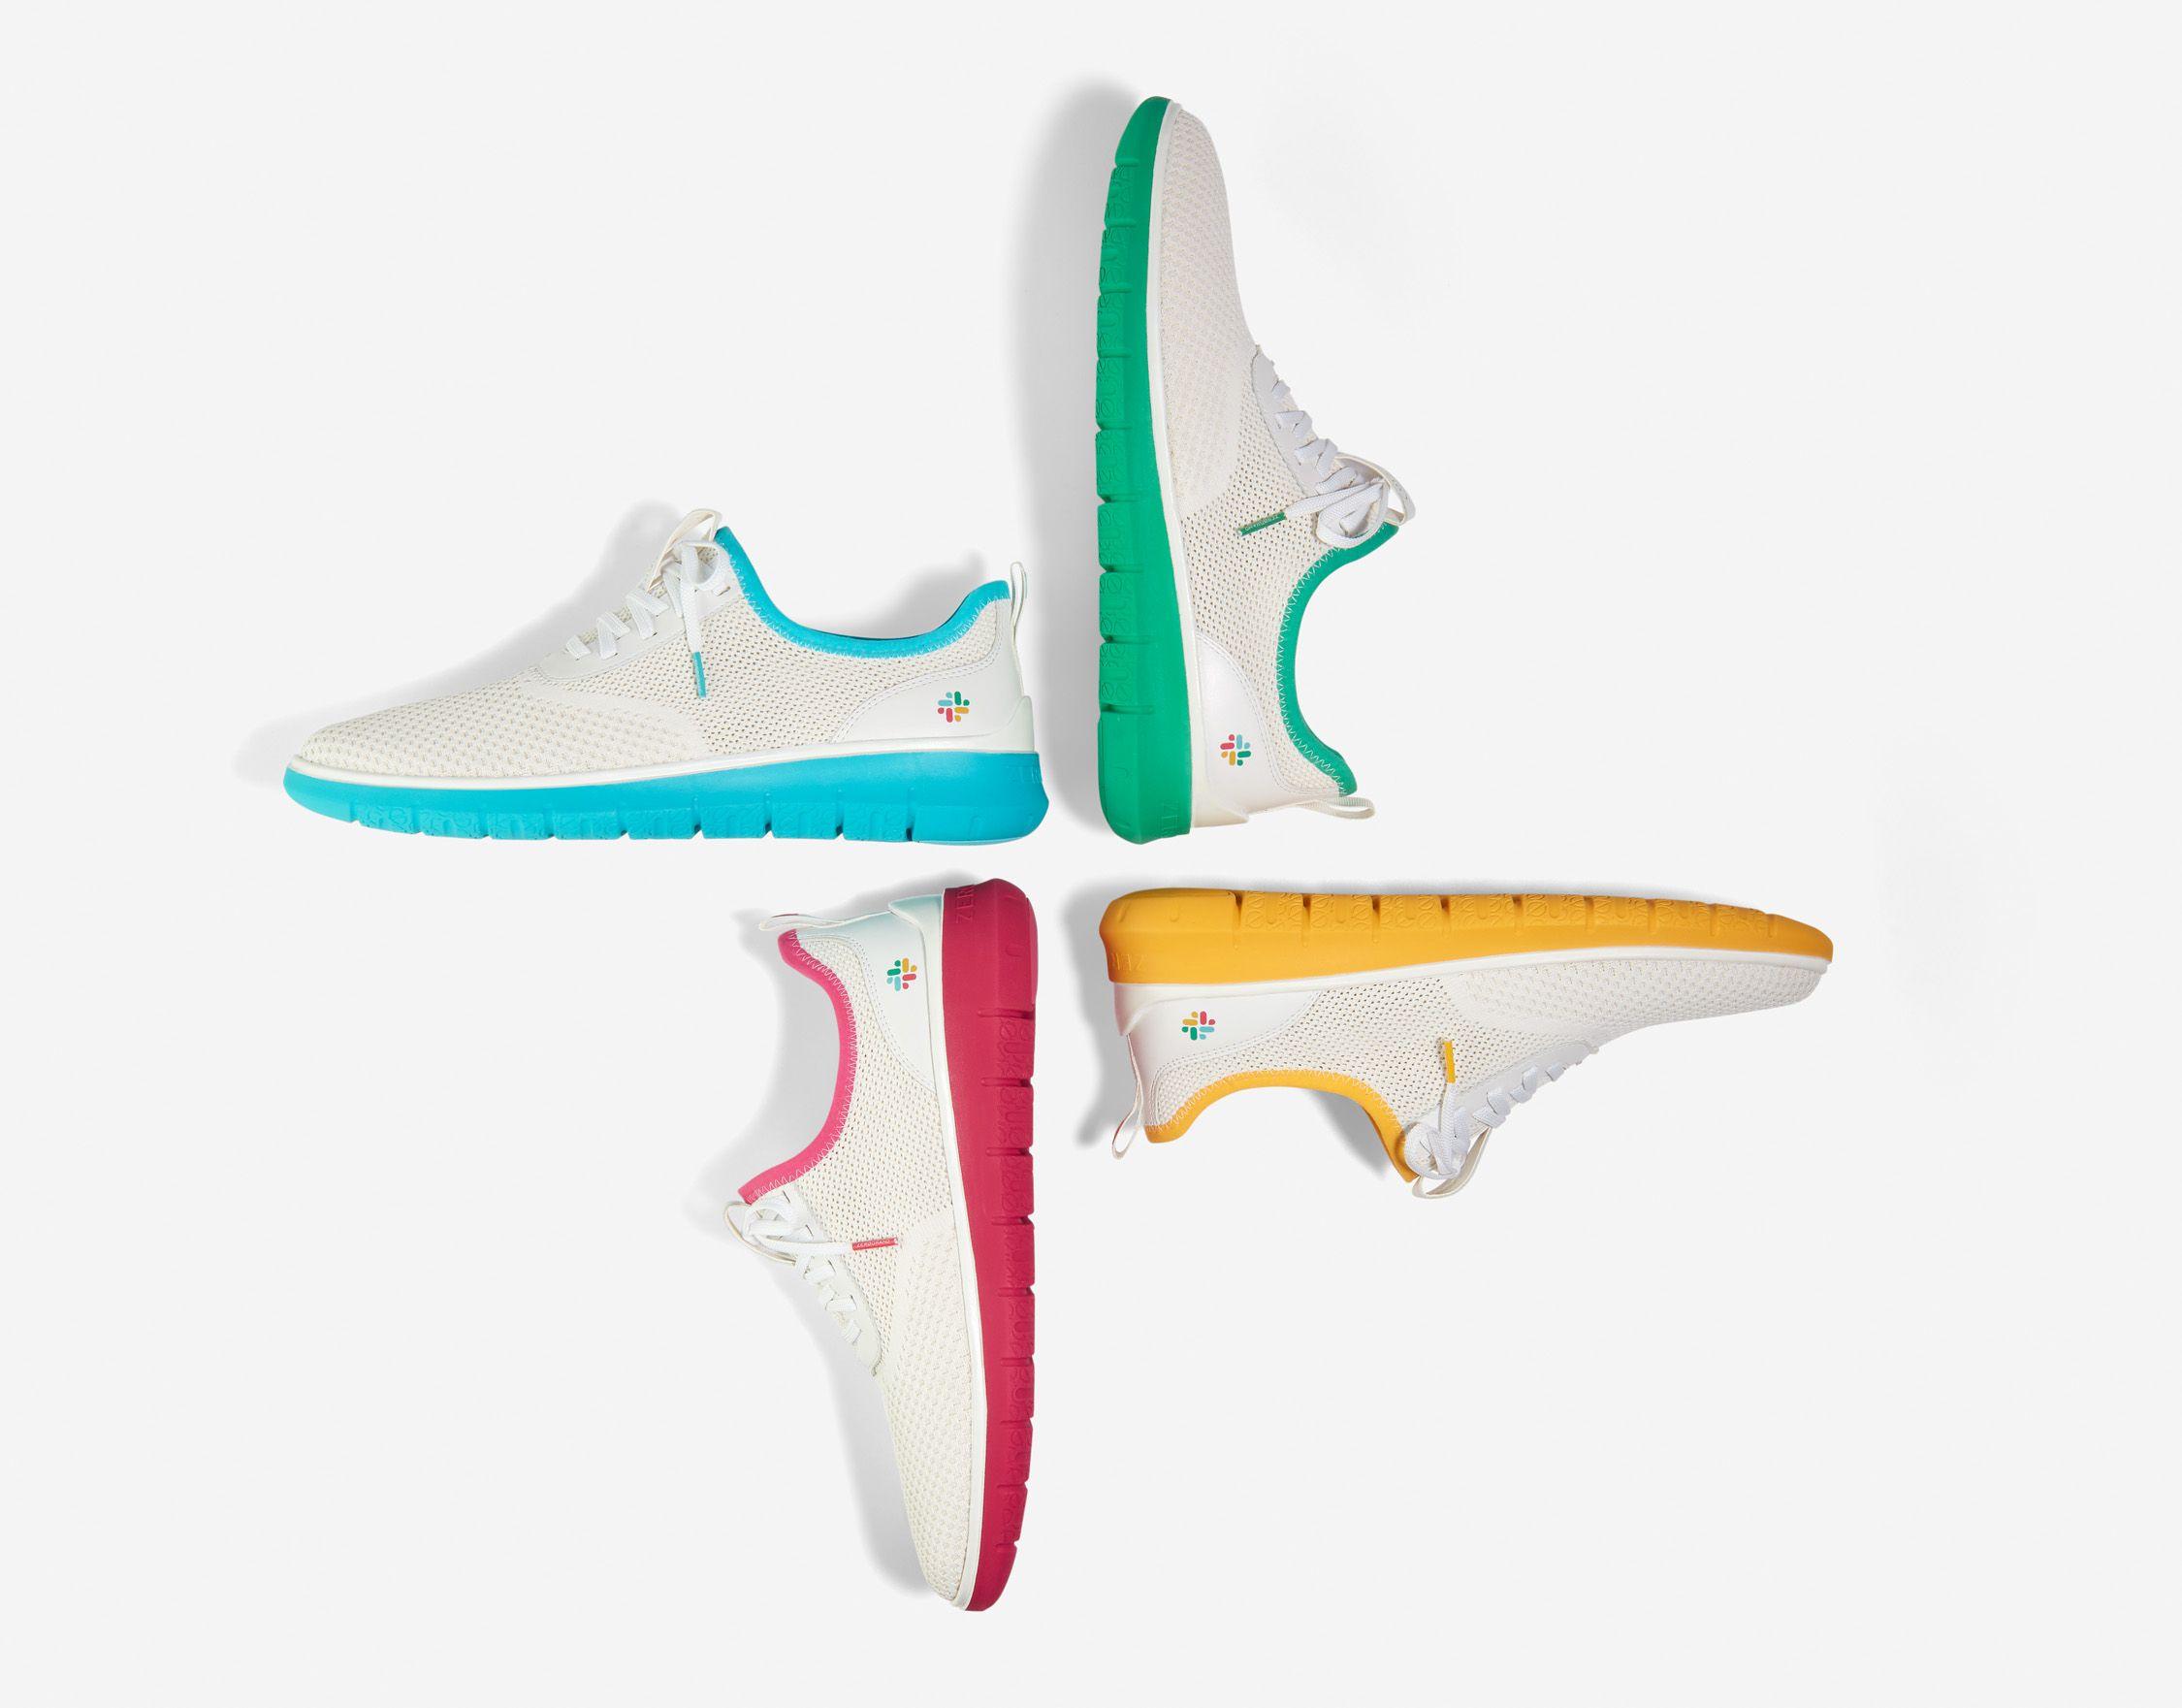 Shoes replicating the Slack logo